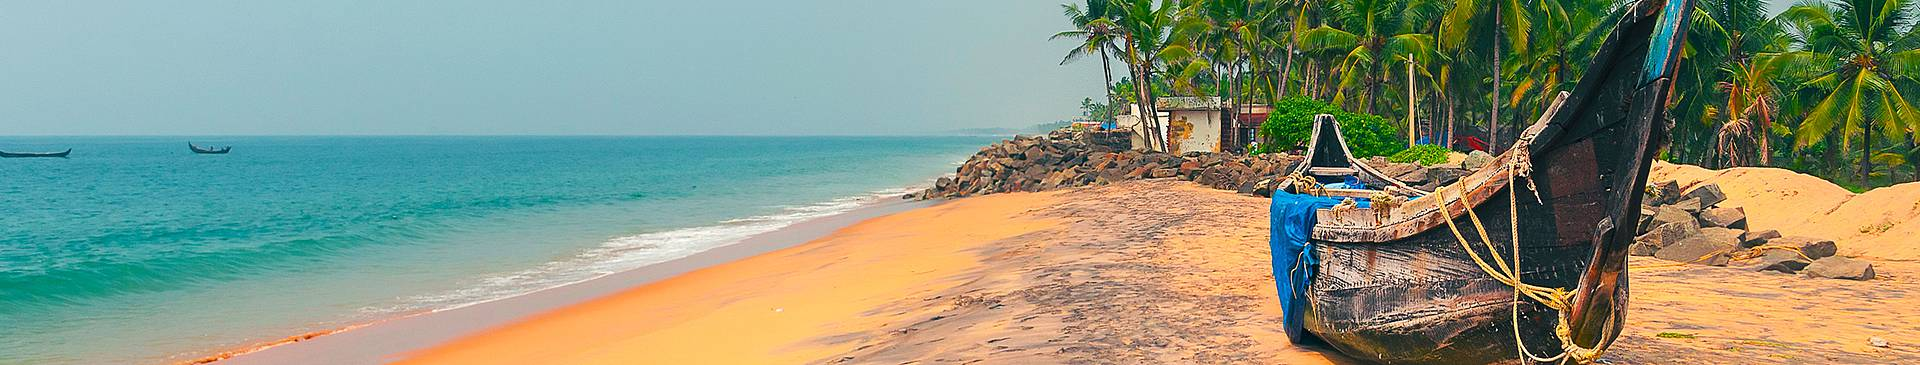 Voyage plage en Inde